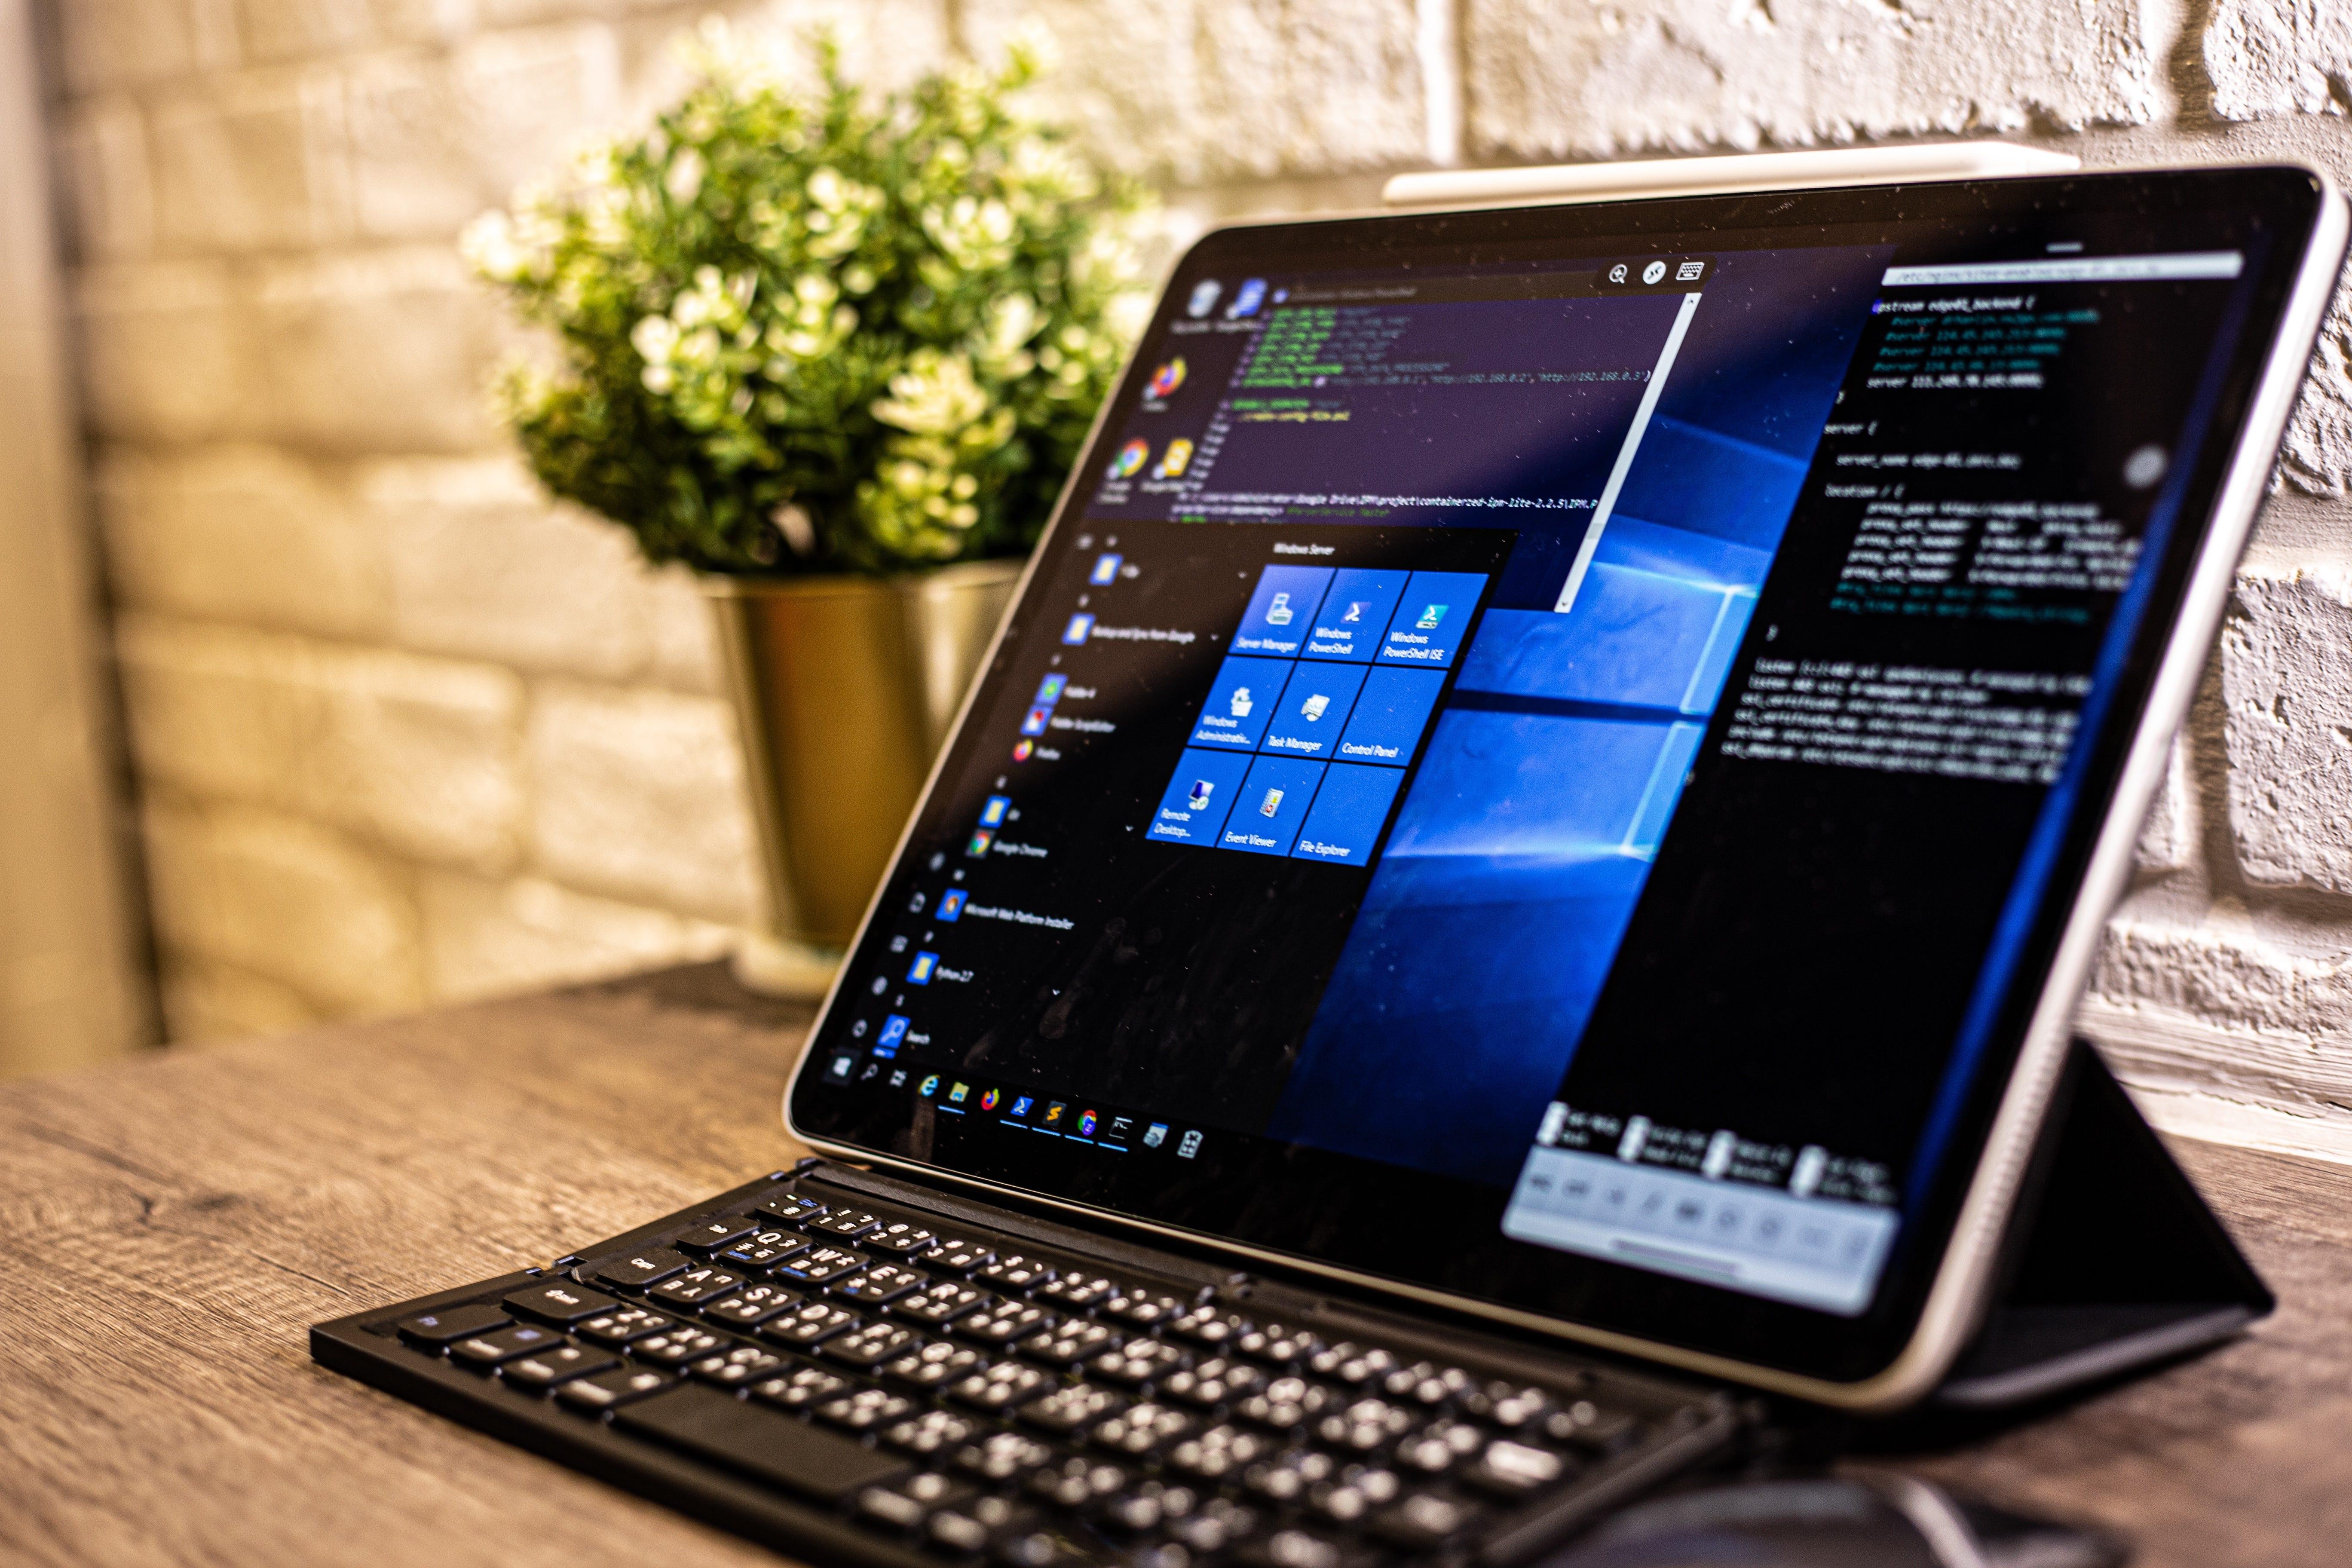 iPad Pro 2020能成為軟體工程師的第二臺電腦嗎?. 工程師的行動辦公室?   by James Shieh   技術保鮮盒   Medium